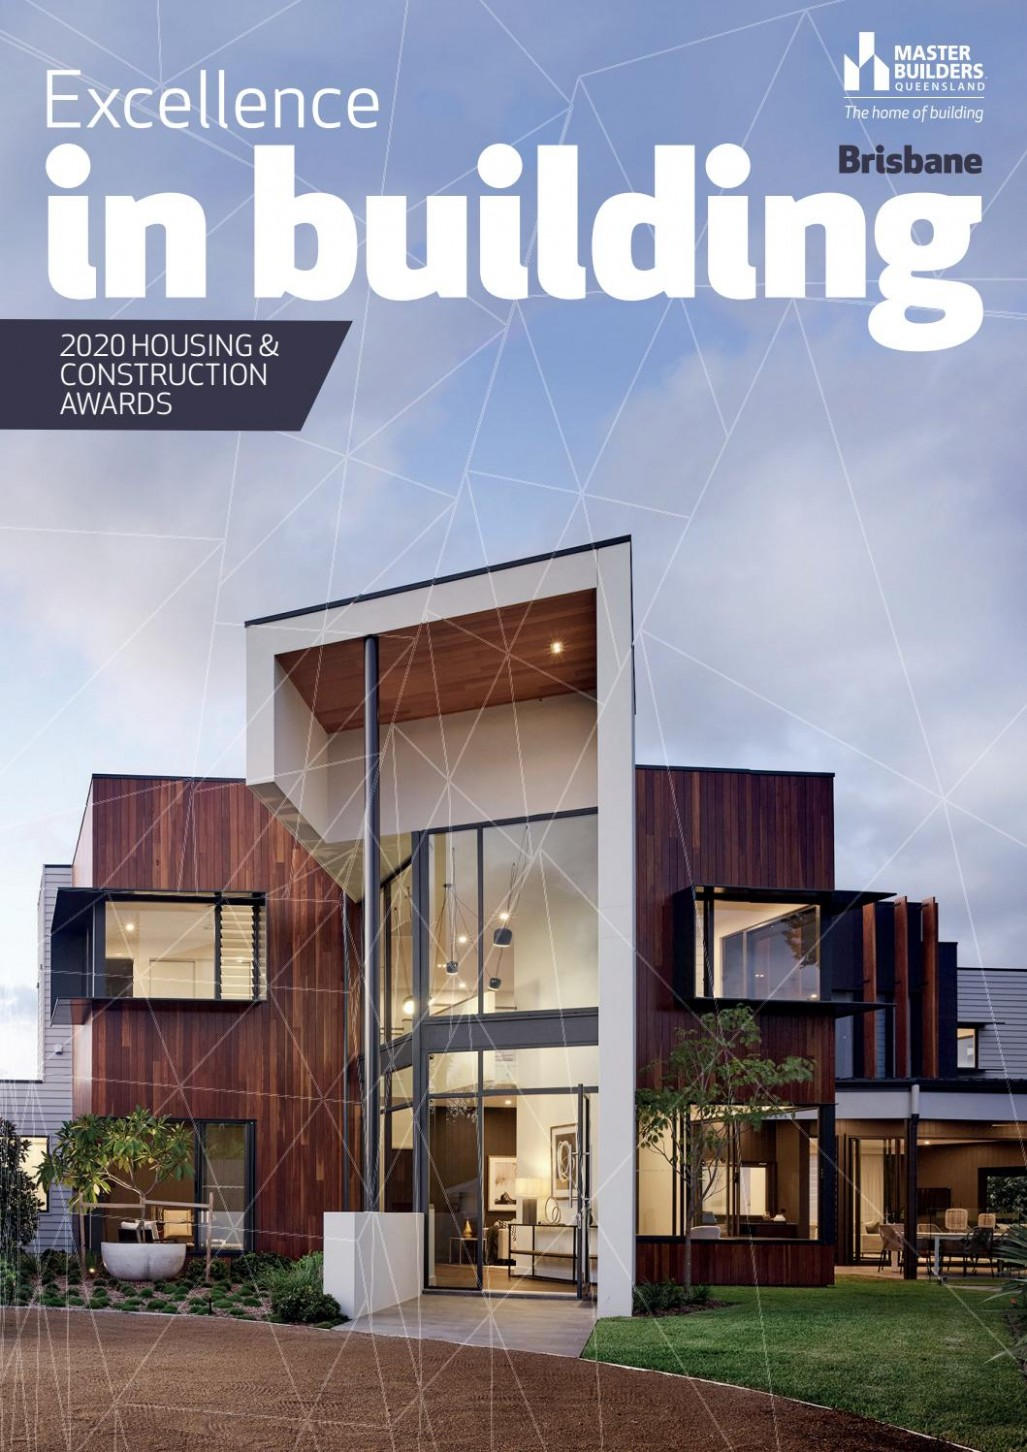 Master Builders Queensland 12 Excellence in Building Brisbane by  - Queensland Apartment Design Guidelines